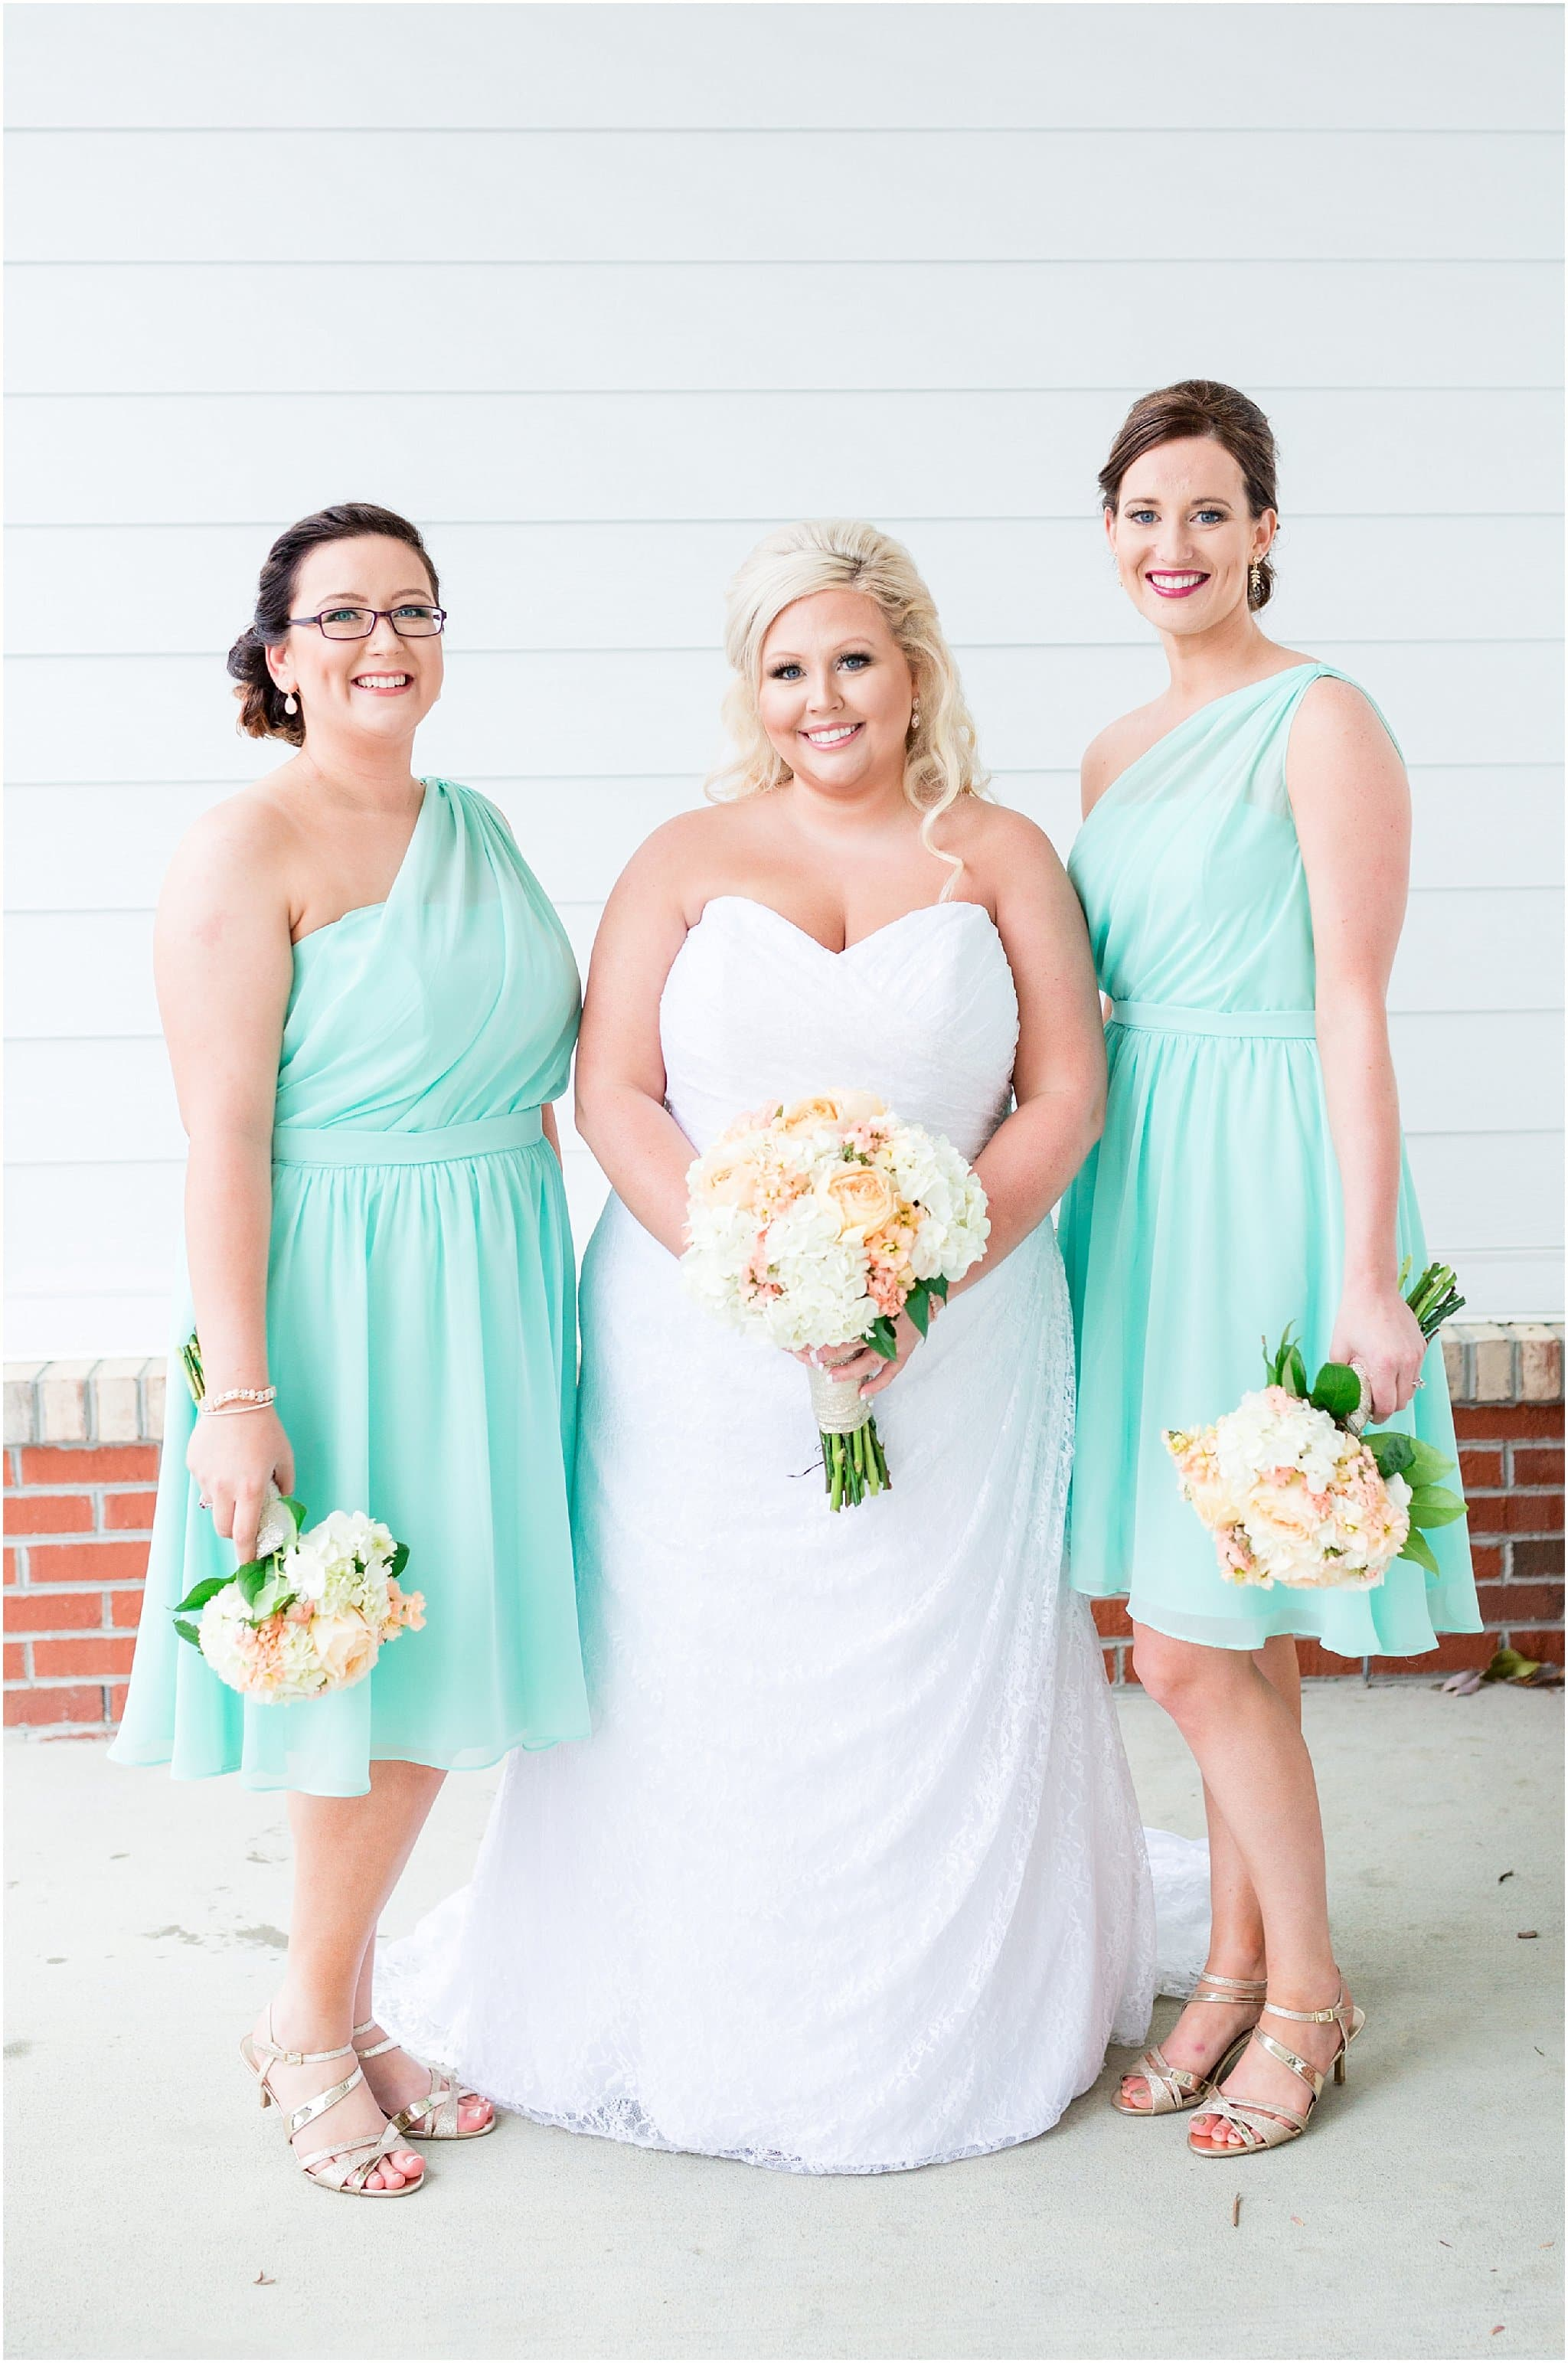 jessscott-milsboro-delaware-wedding-cassidymrphotography_0028